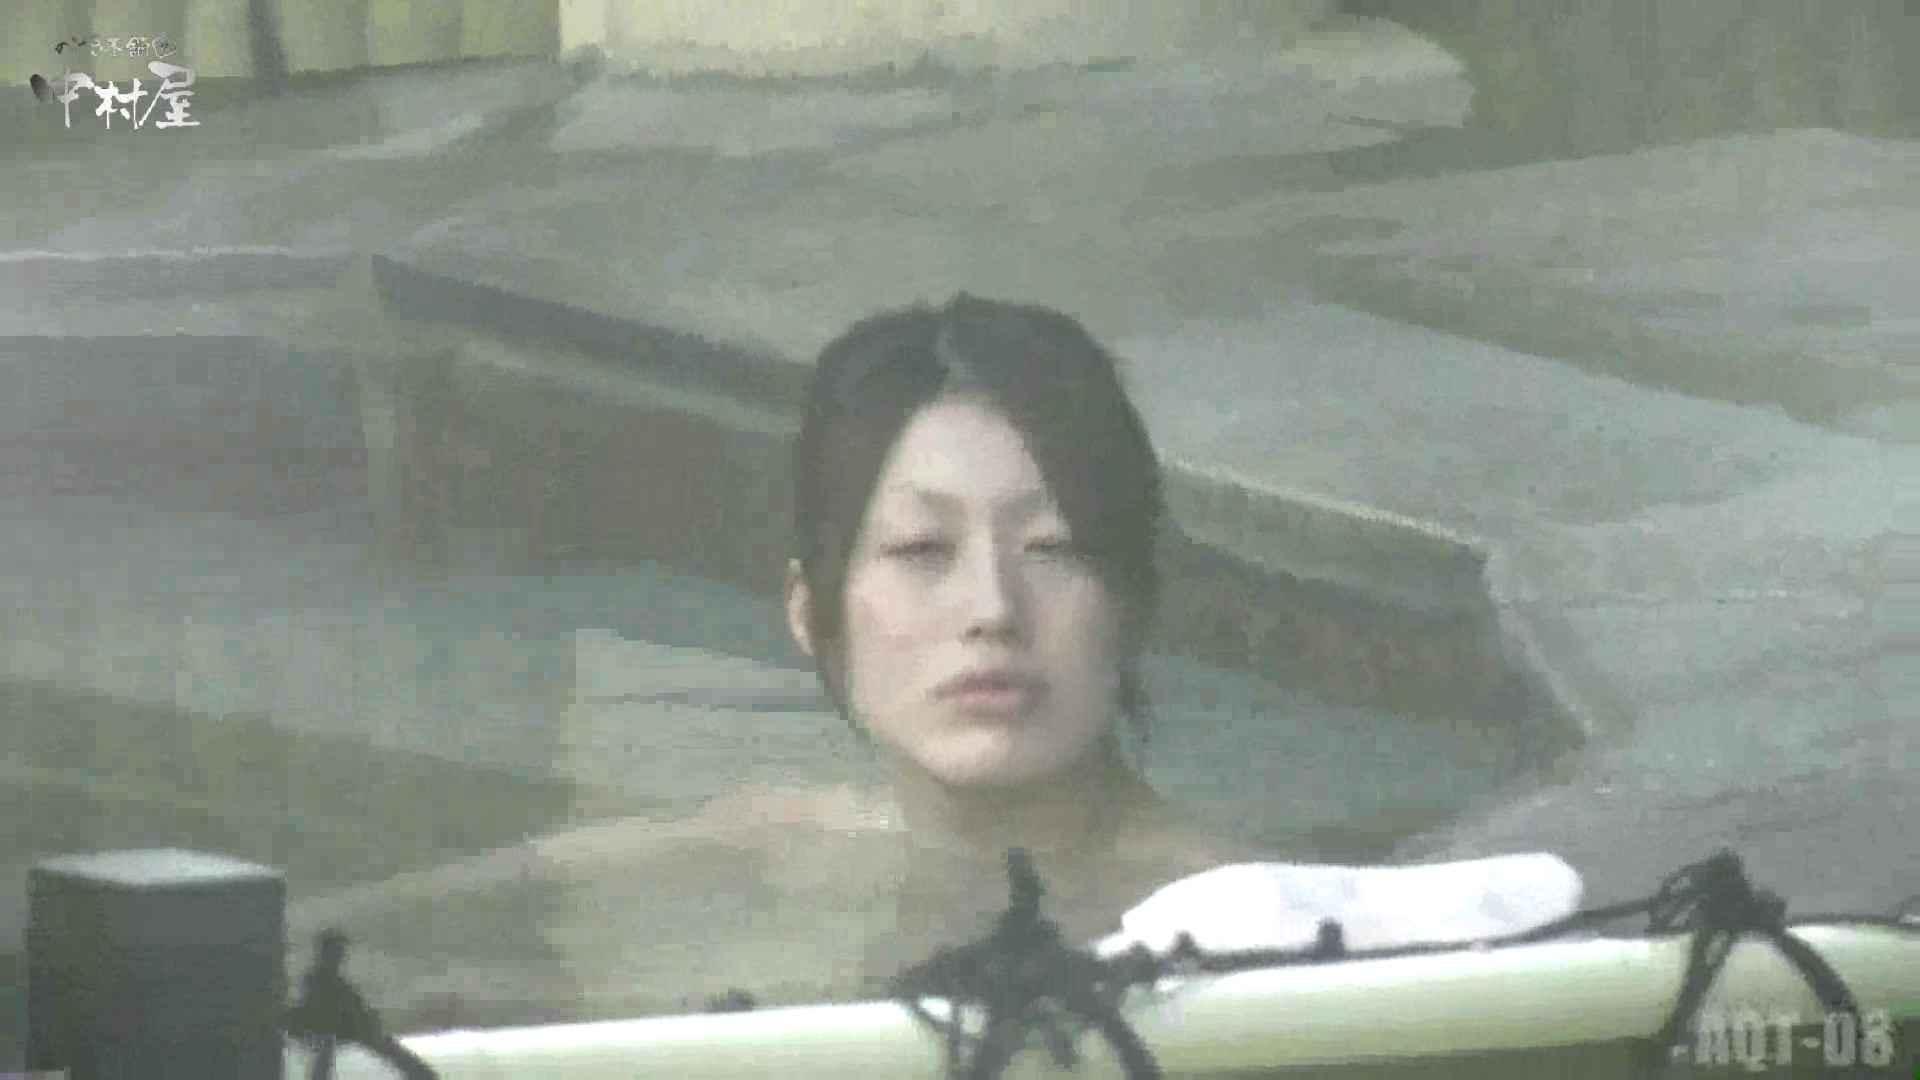 Aquaな露天風呂Vol.872潜入盗撮露天風呂八判湯 其の三 盗撮特集 | 潜入画像  96画像 68